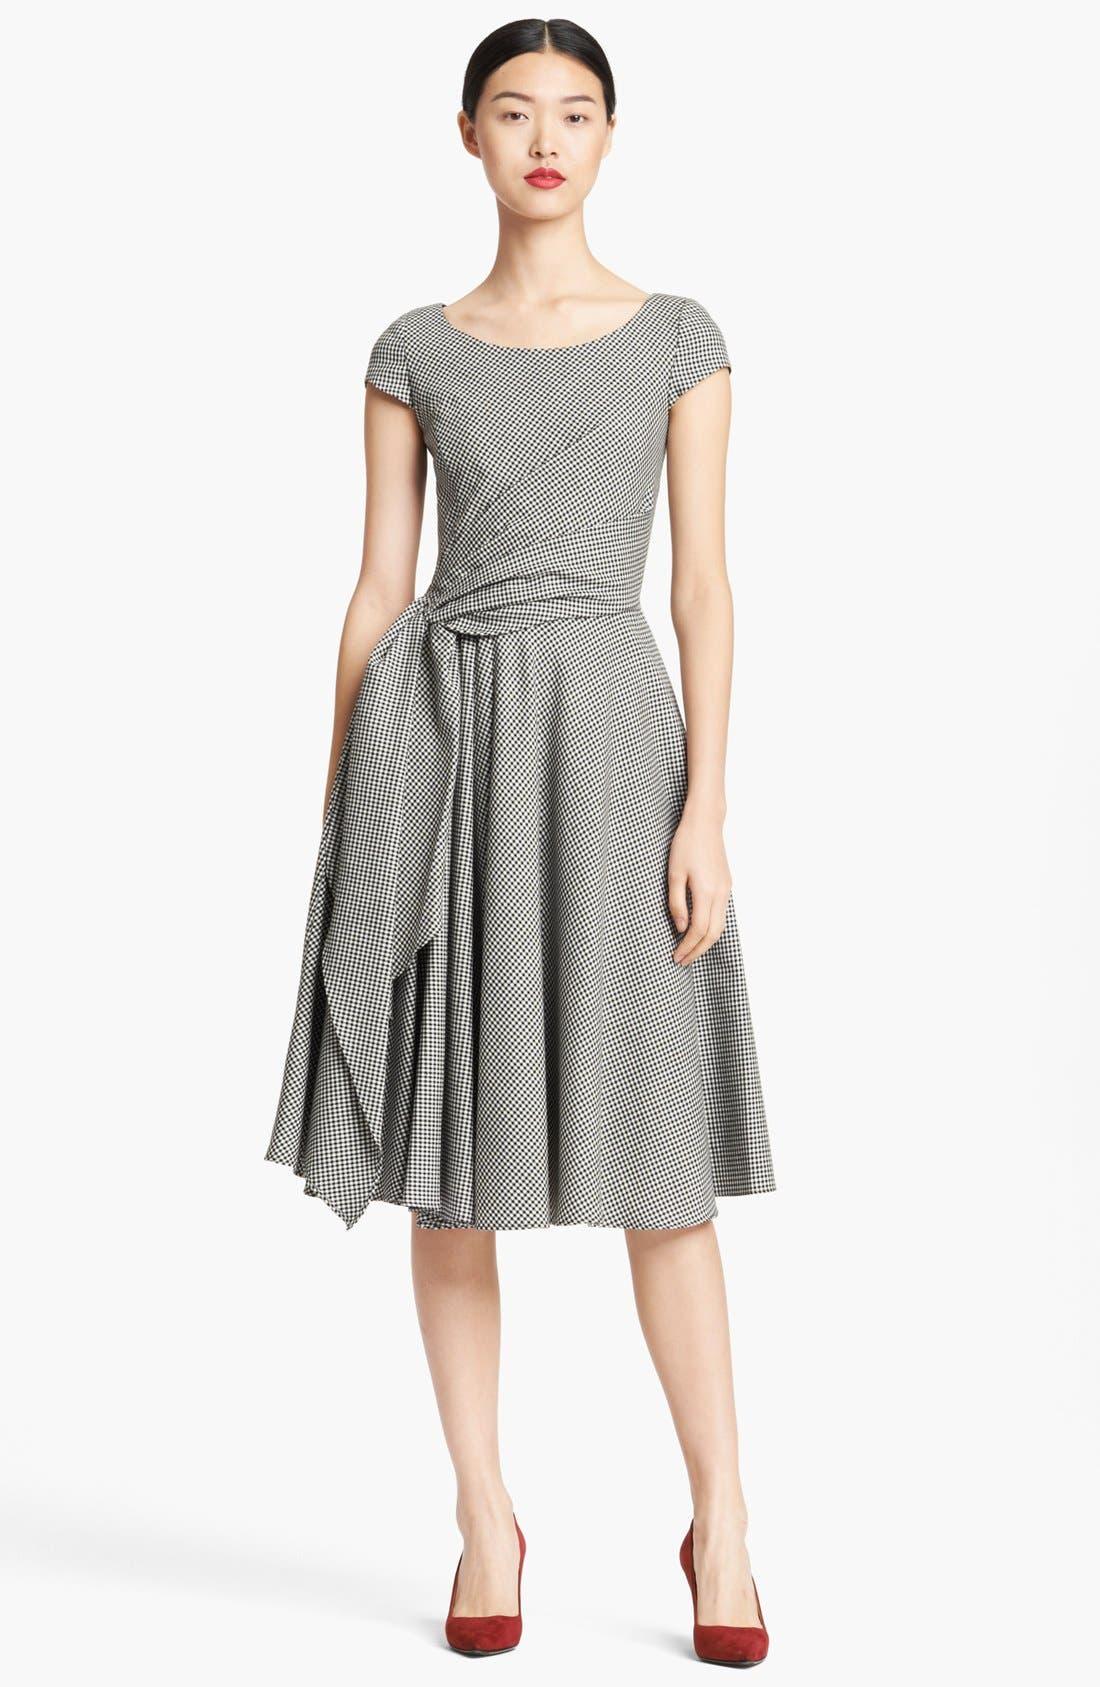 Main Image - Oscar de la Renta Full Skirt Gingham Dress